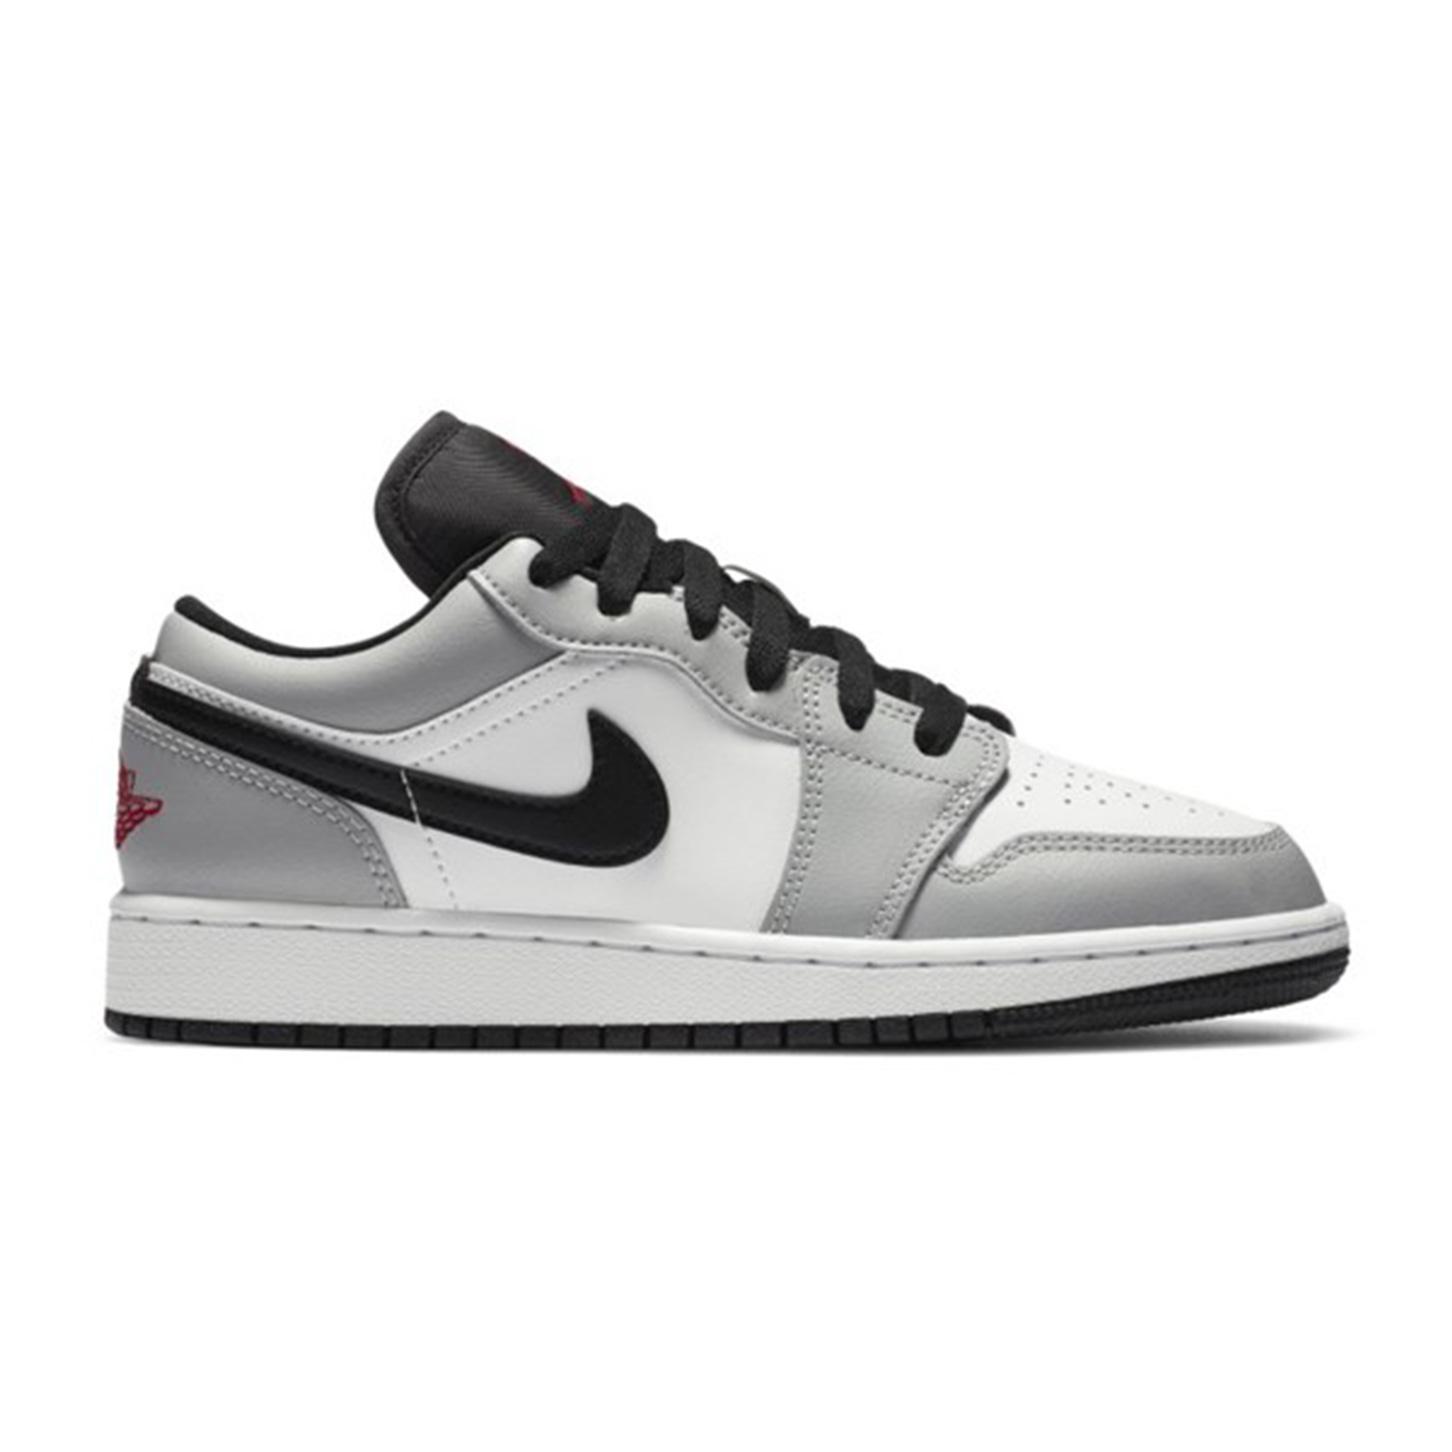 Jordan 1 Low Light Smoke Grey (GS)